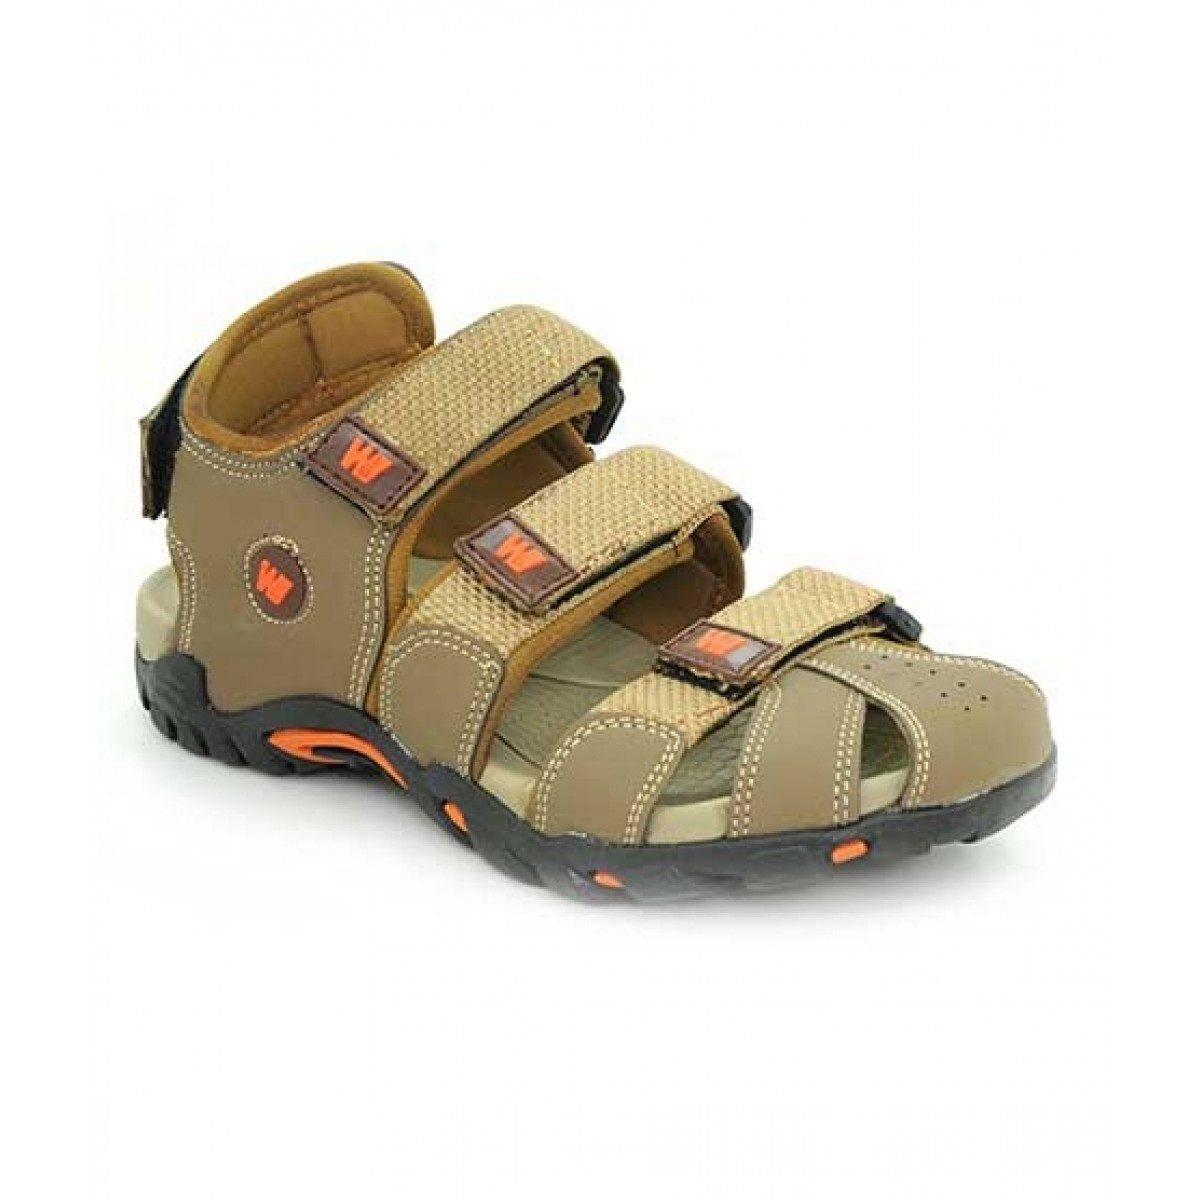 087c9dbf7 Bata Synthetic Sandal Men Brow Price in Pakistan | Buy Bata Synthetic  Sandal Men (463-3847) | iShopping.pk